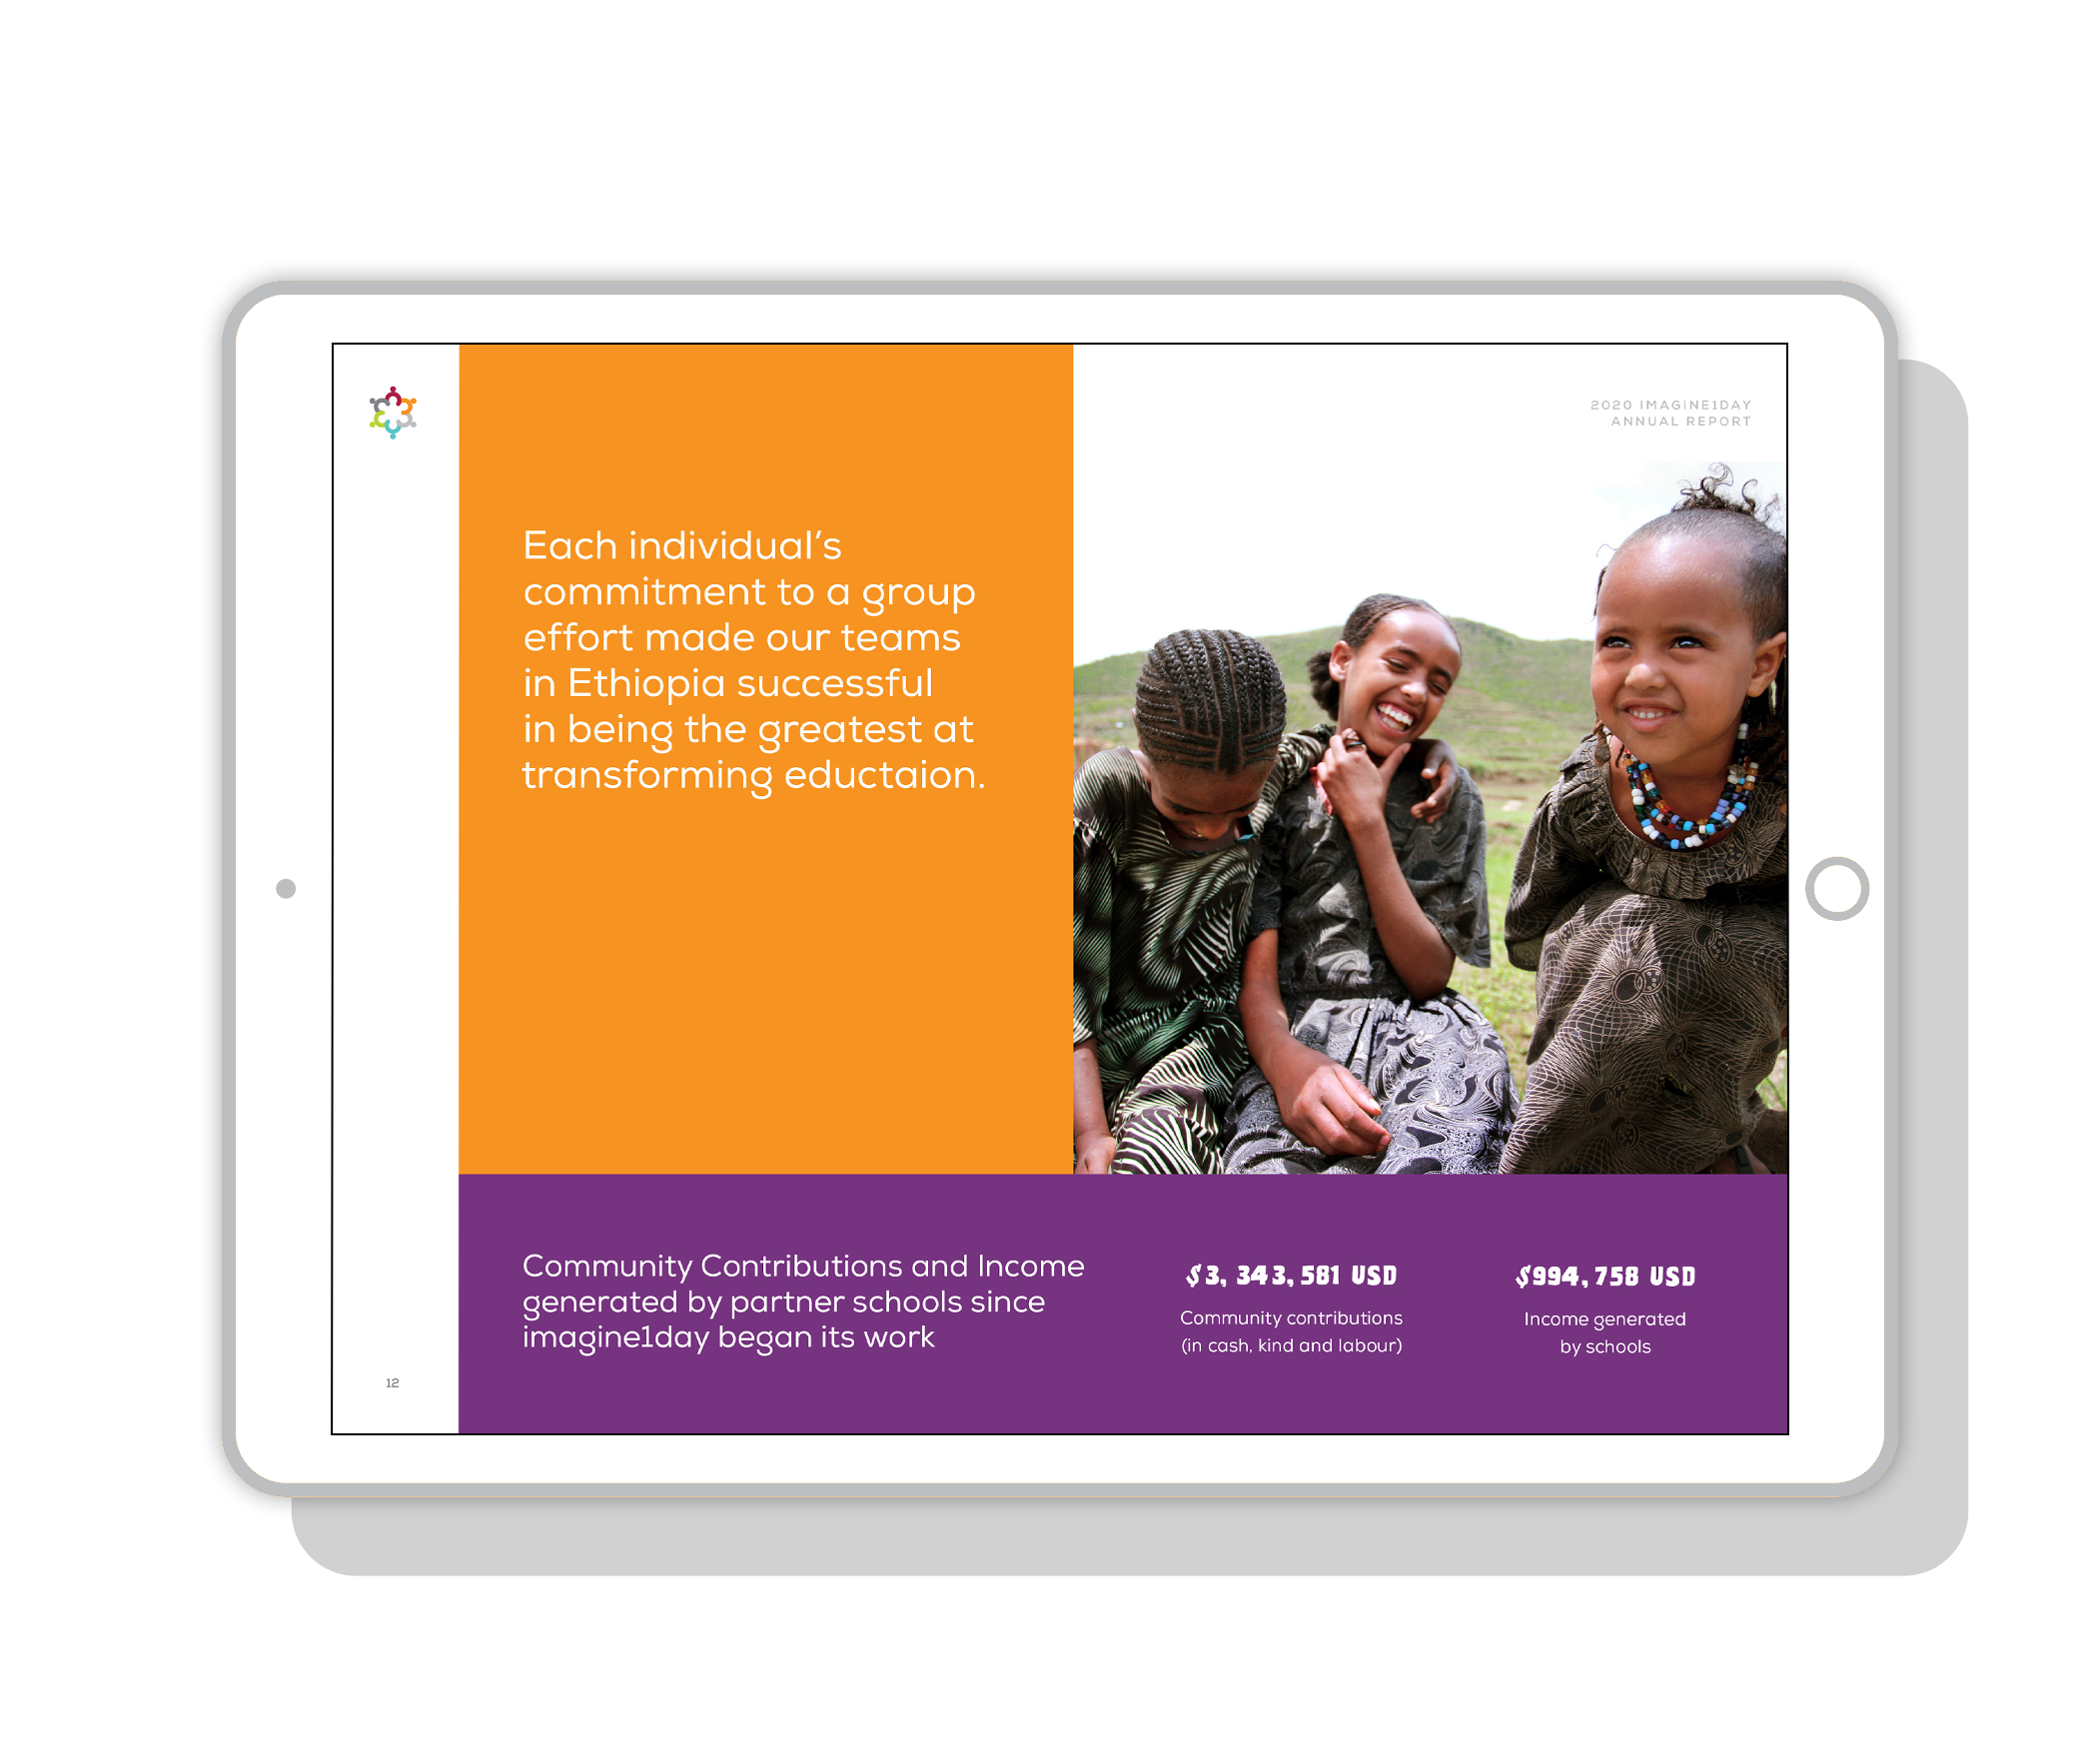 imagine1day digital Annual Report, community contributors   www.alicia-carvalho.com